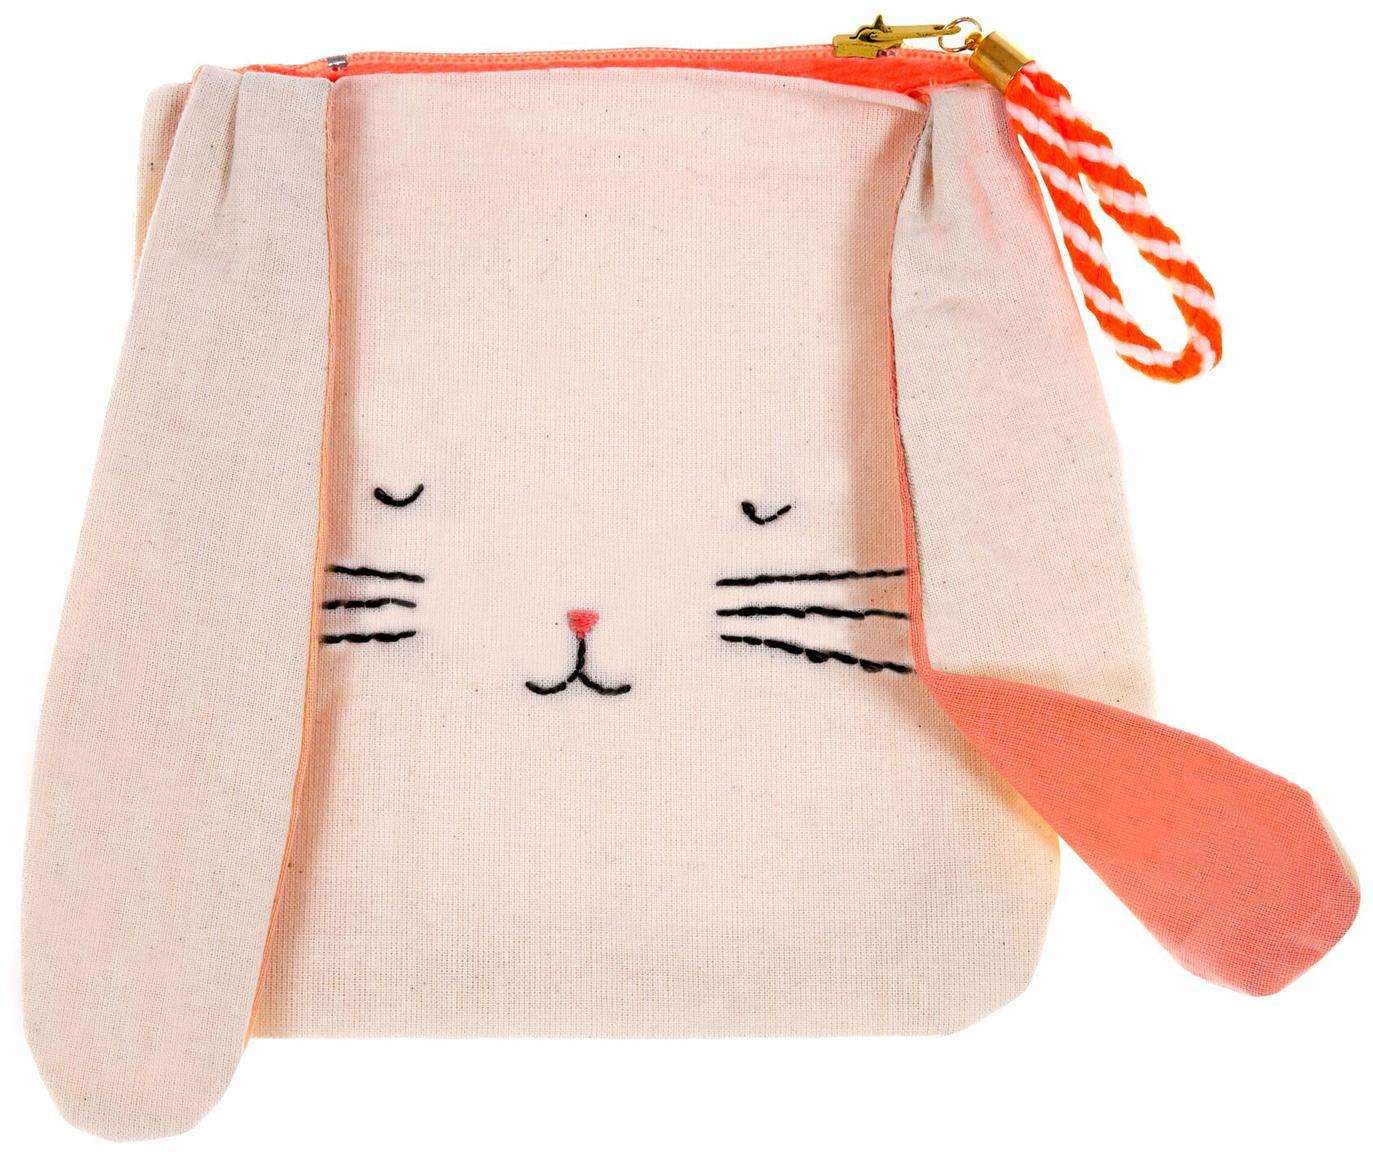 Monedero infantil Bunny, Lino, Beige, naranja, negro, An 13 x Al 15 cm